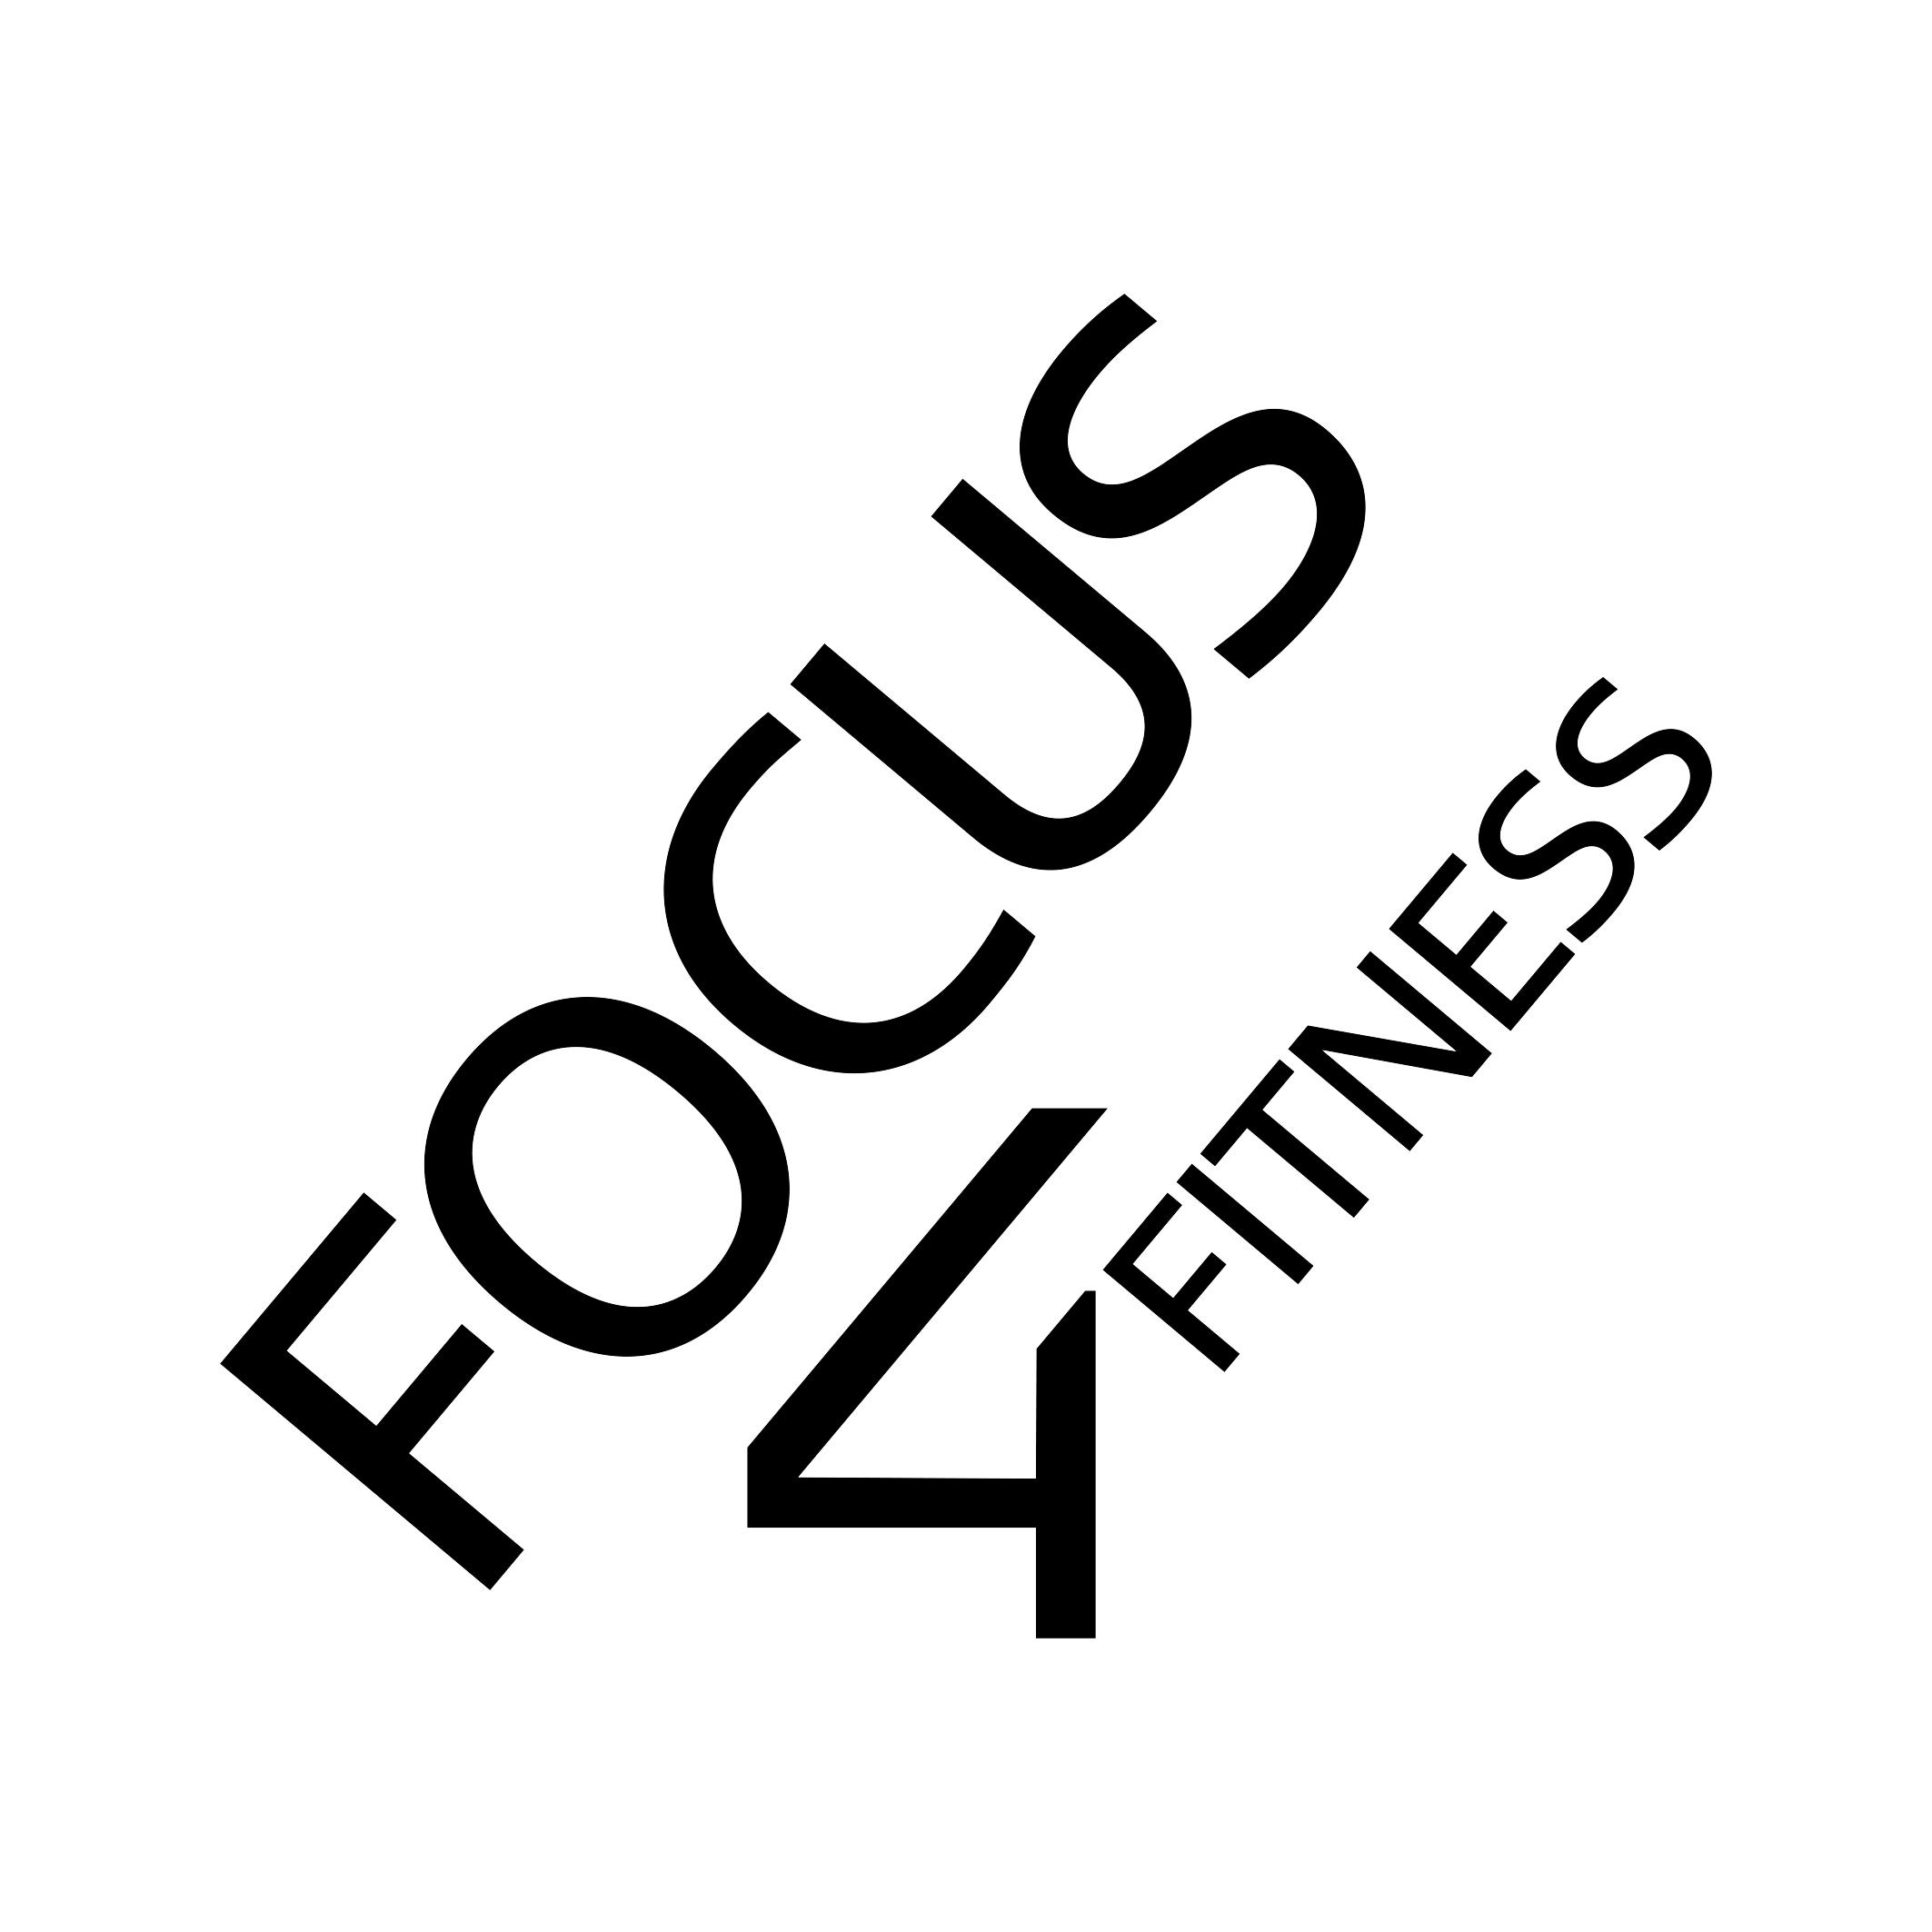 focus4fitness_logo_revCMversionmjk.png